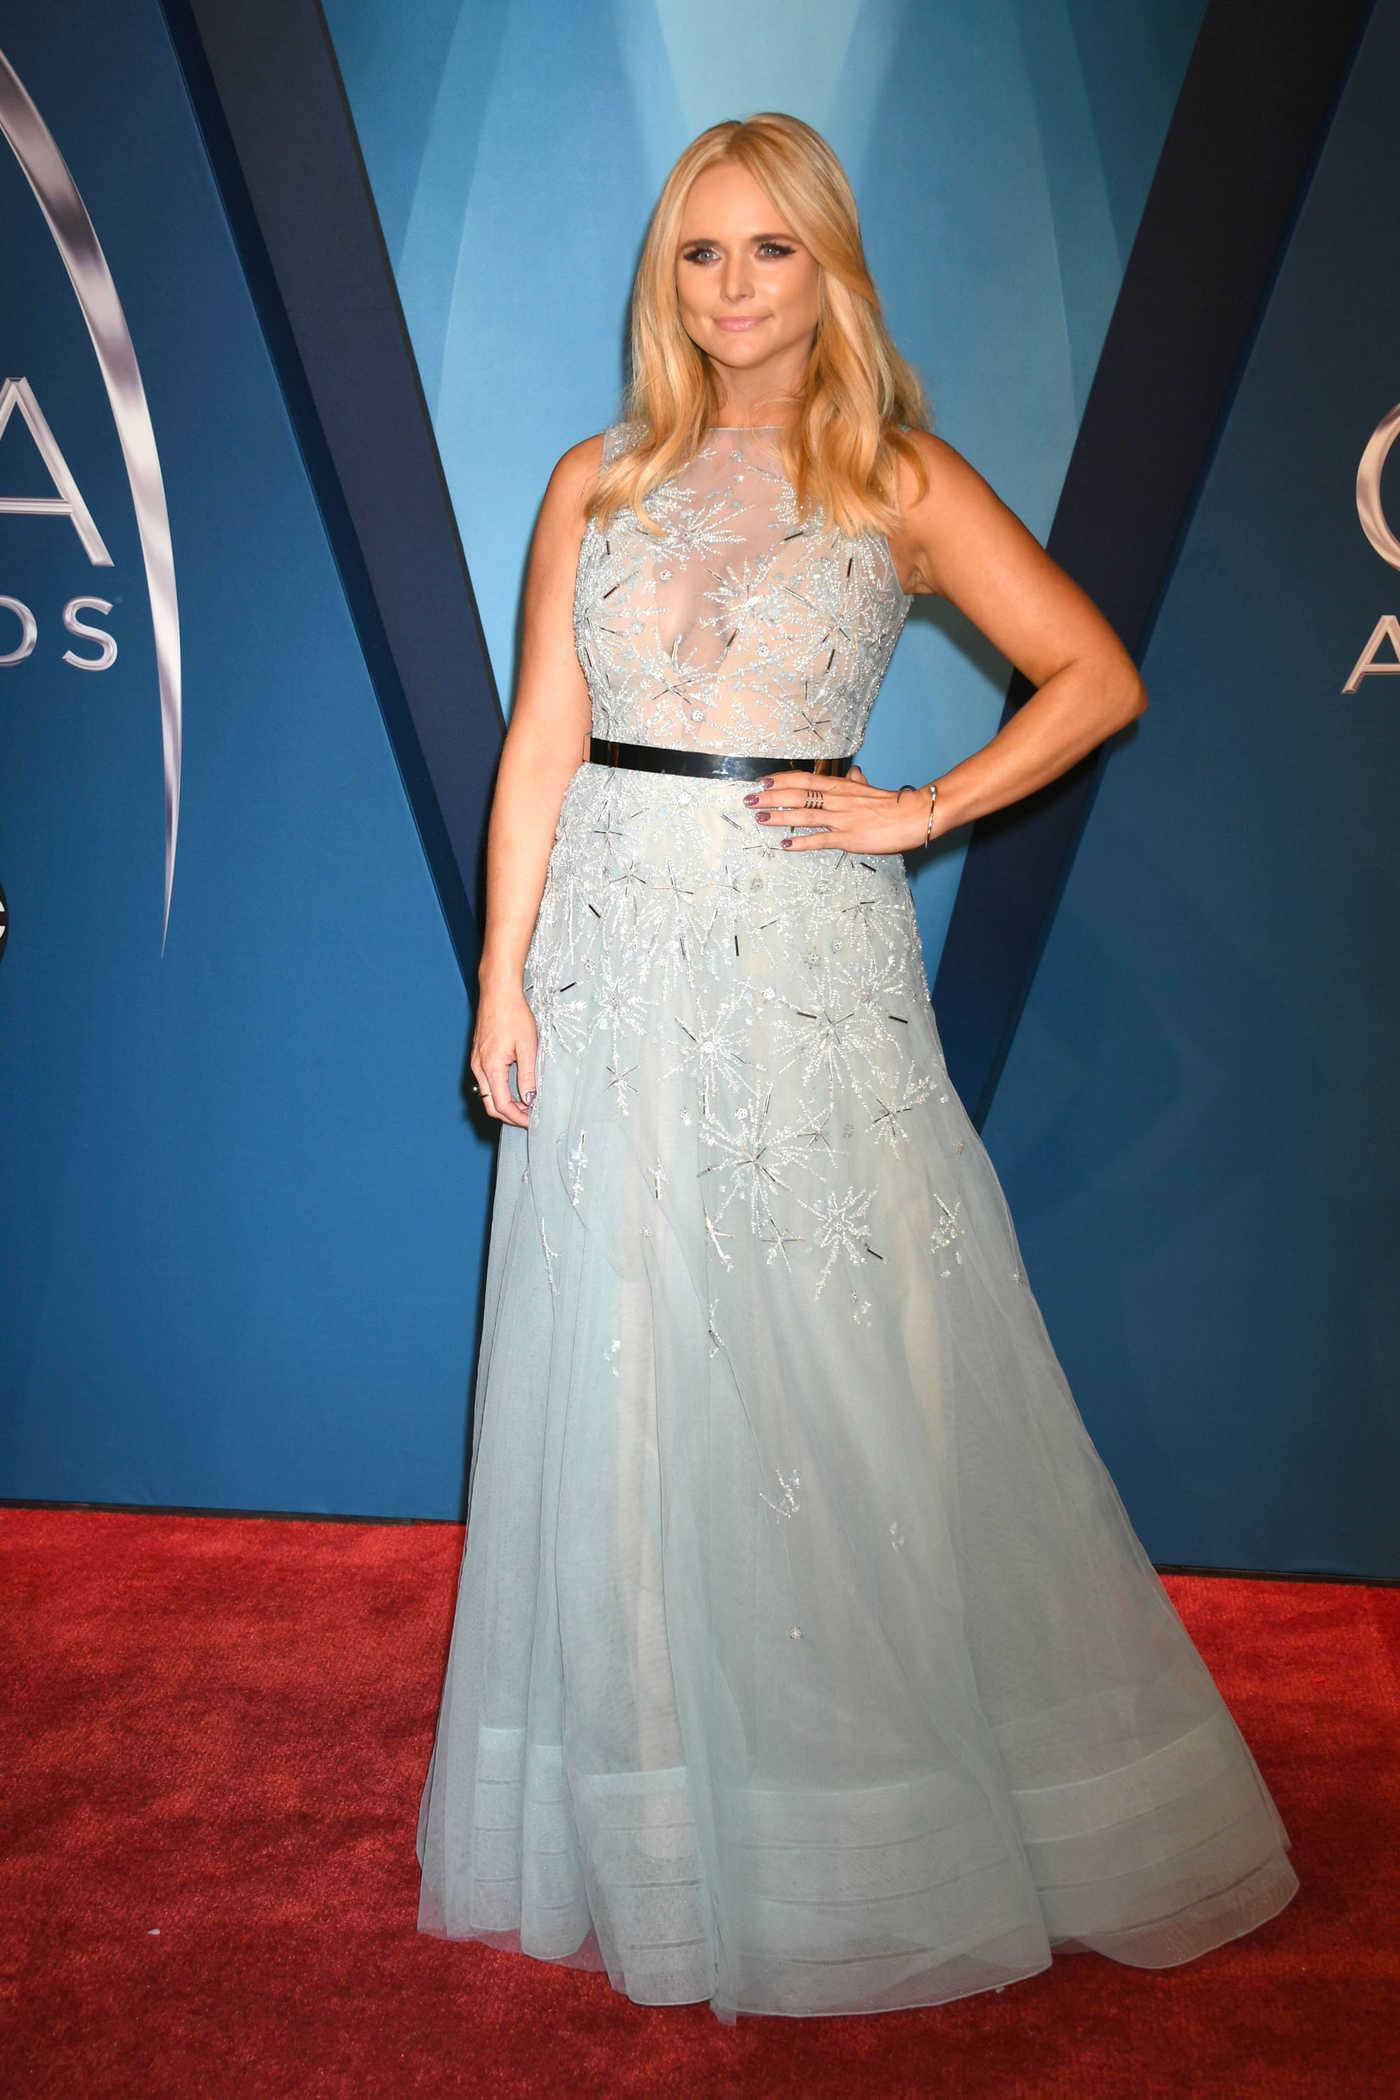 Miranda Lambert at the 51st Annual CMA Awards at the Bridgestone Arena in Nashville 11/08/2017